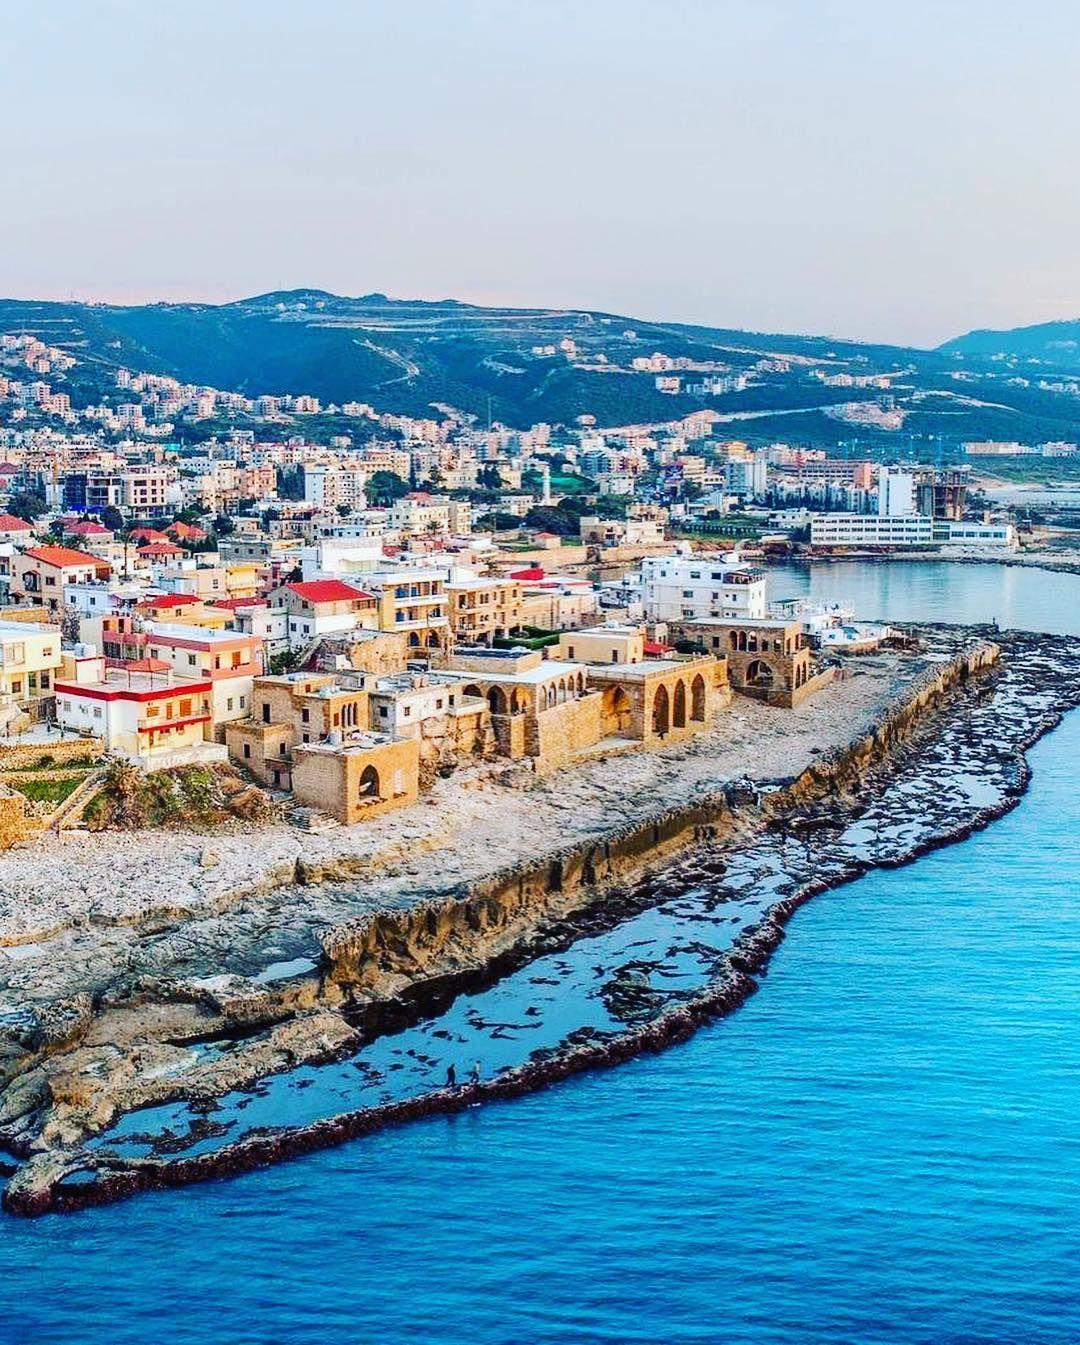 Reise Nach Libanon In 2020 Reisen Libanon Leben